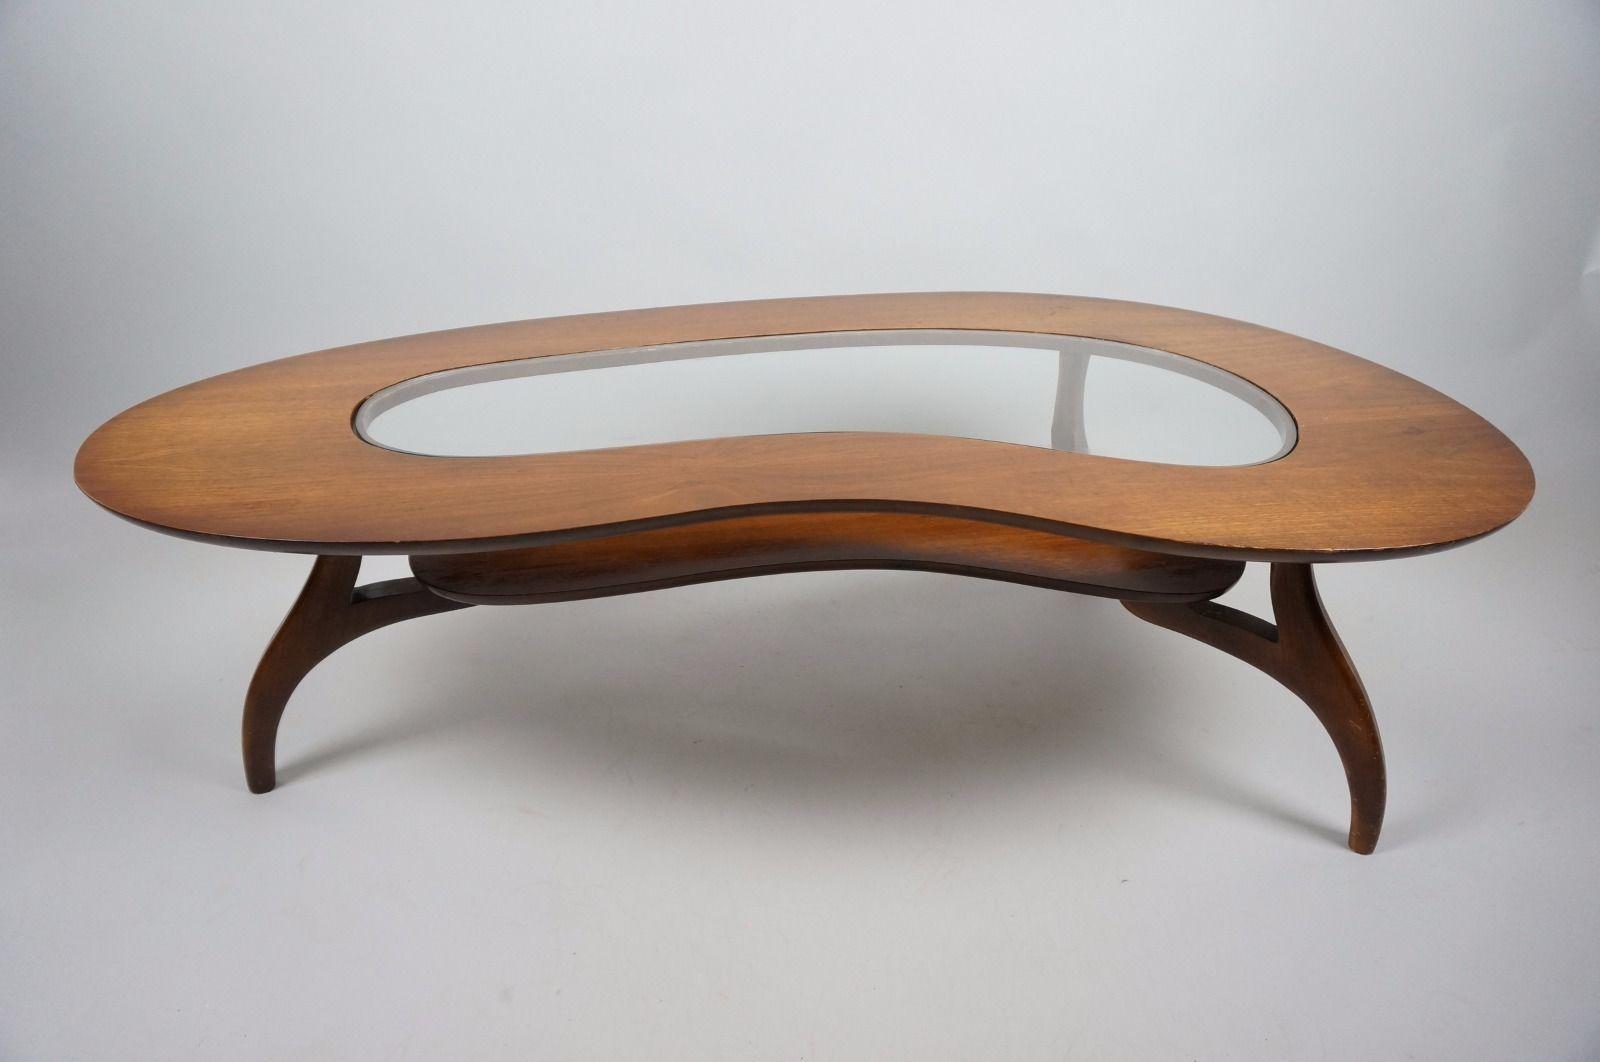 Mid Century Danish Modern Kidney Shaped Coffee Table Eames Kagan